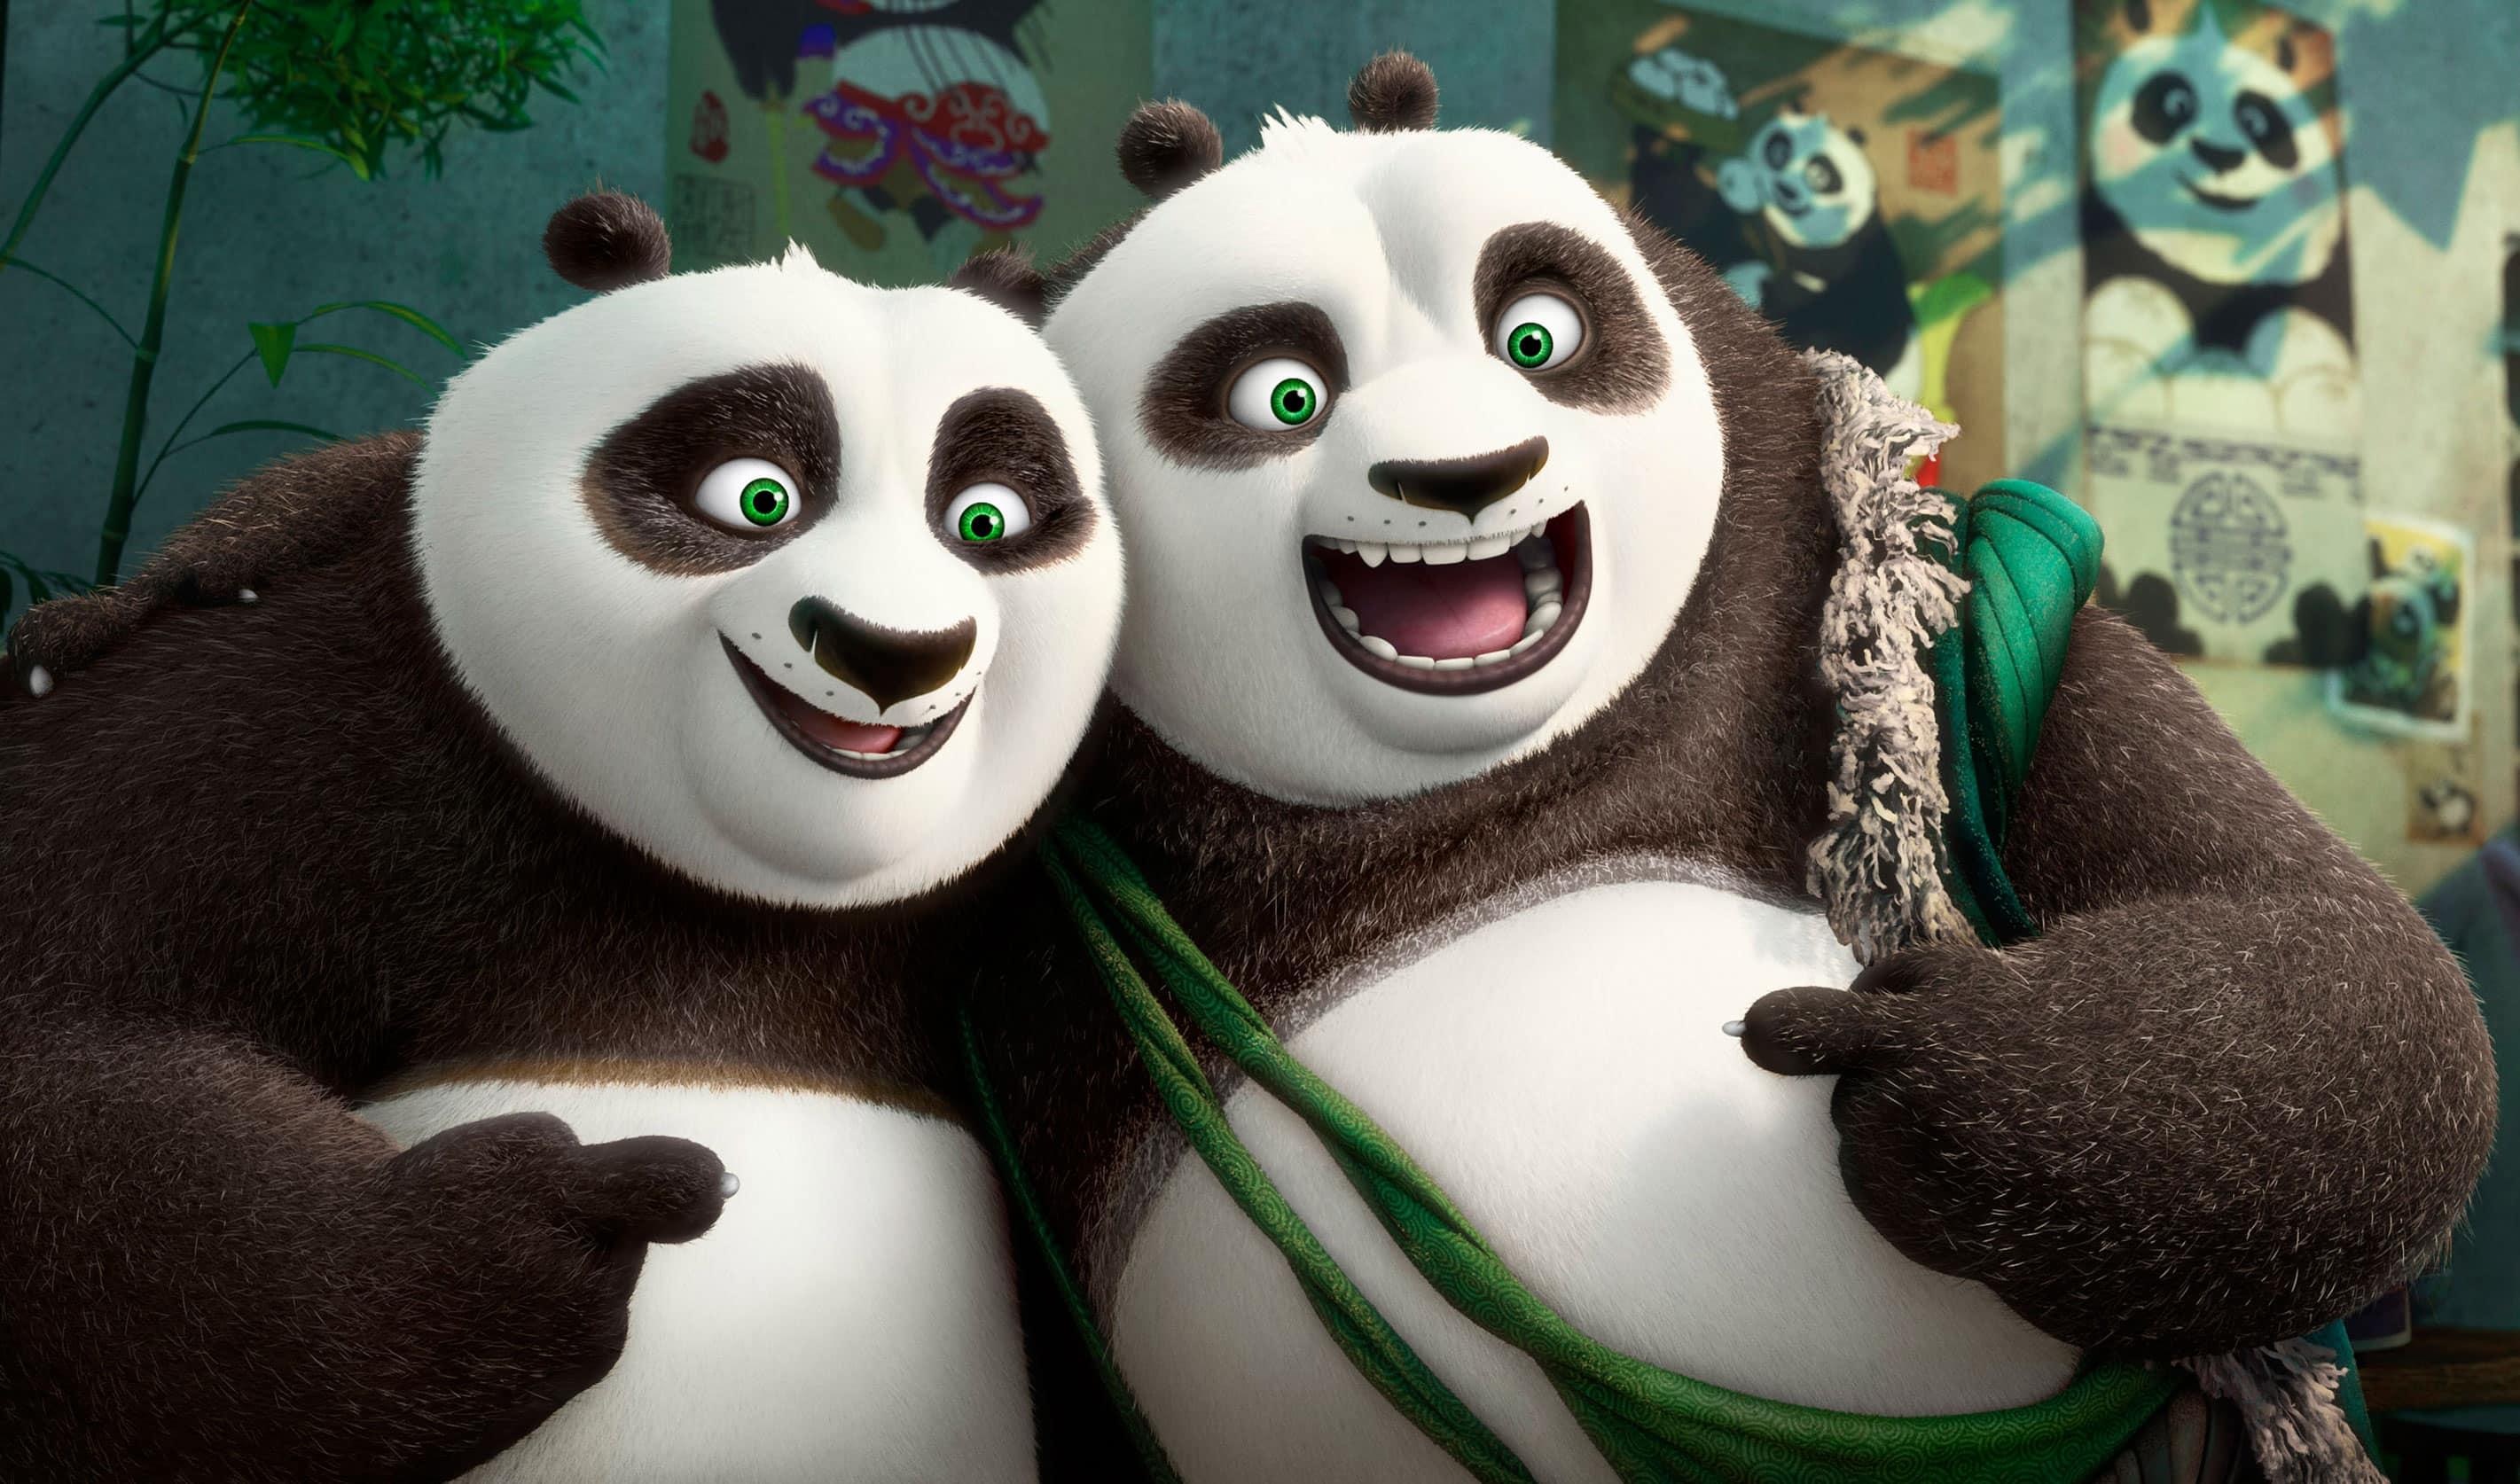 'कुंग फू पांडा 3' को मिला एक नया ट्रेलर